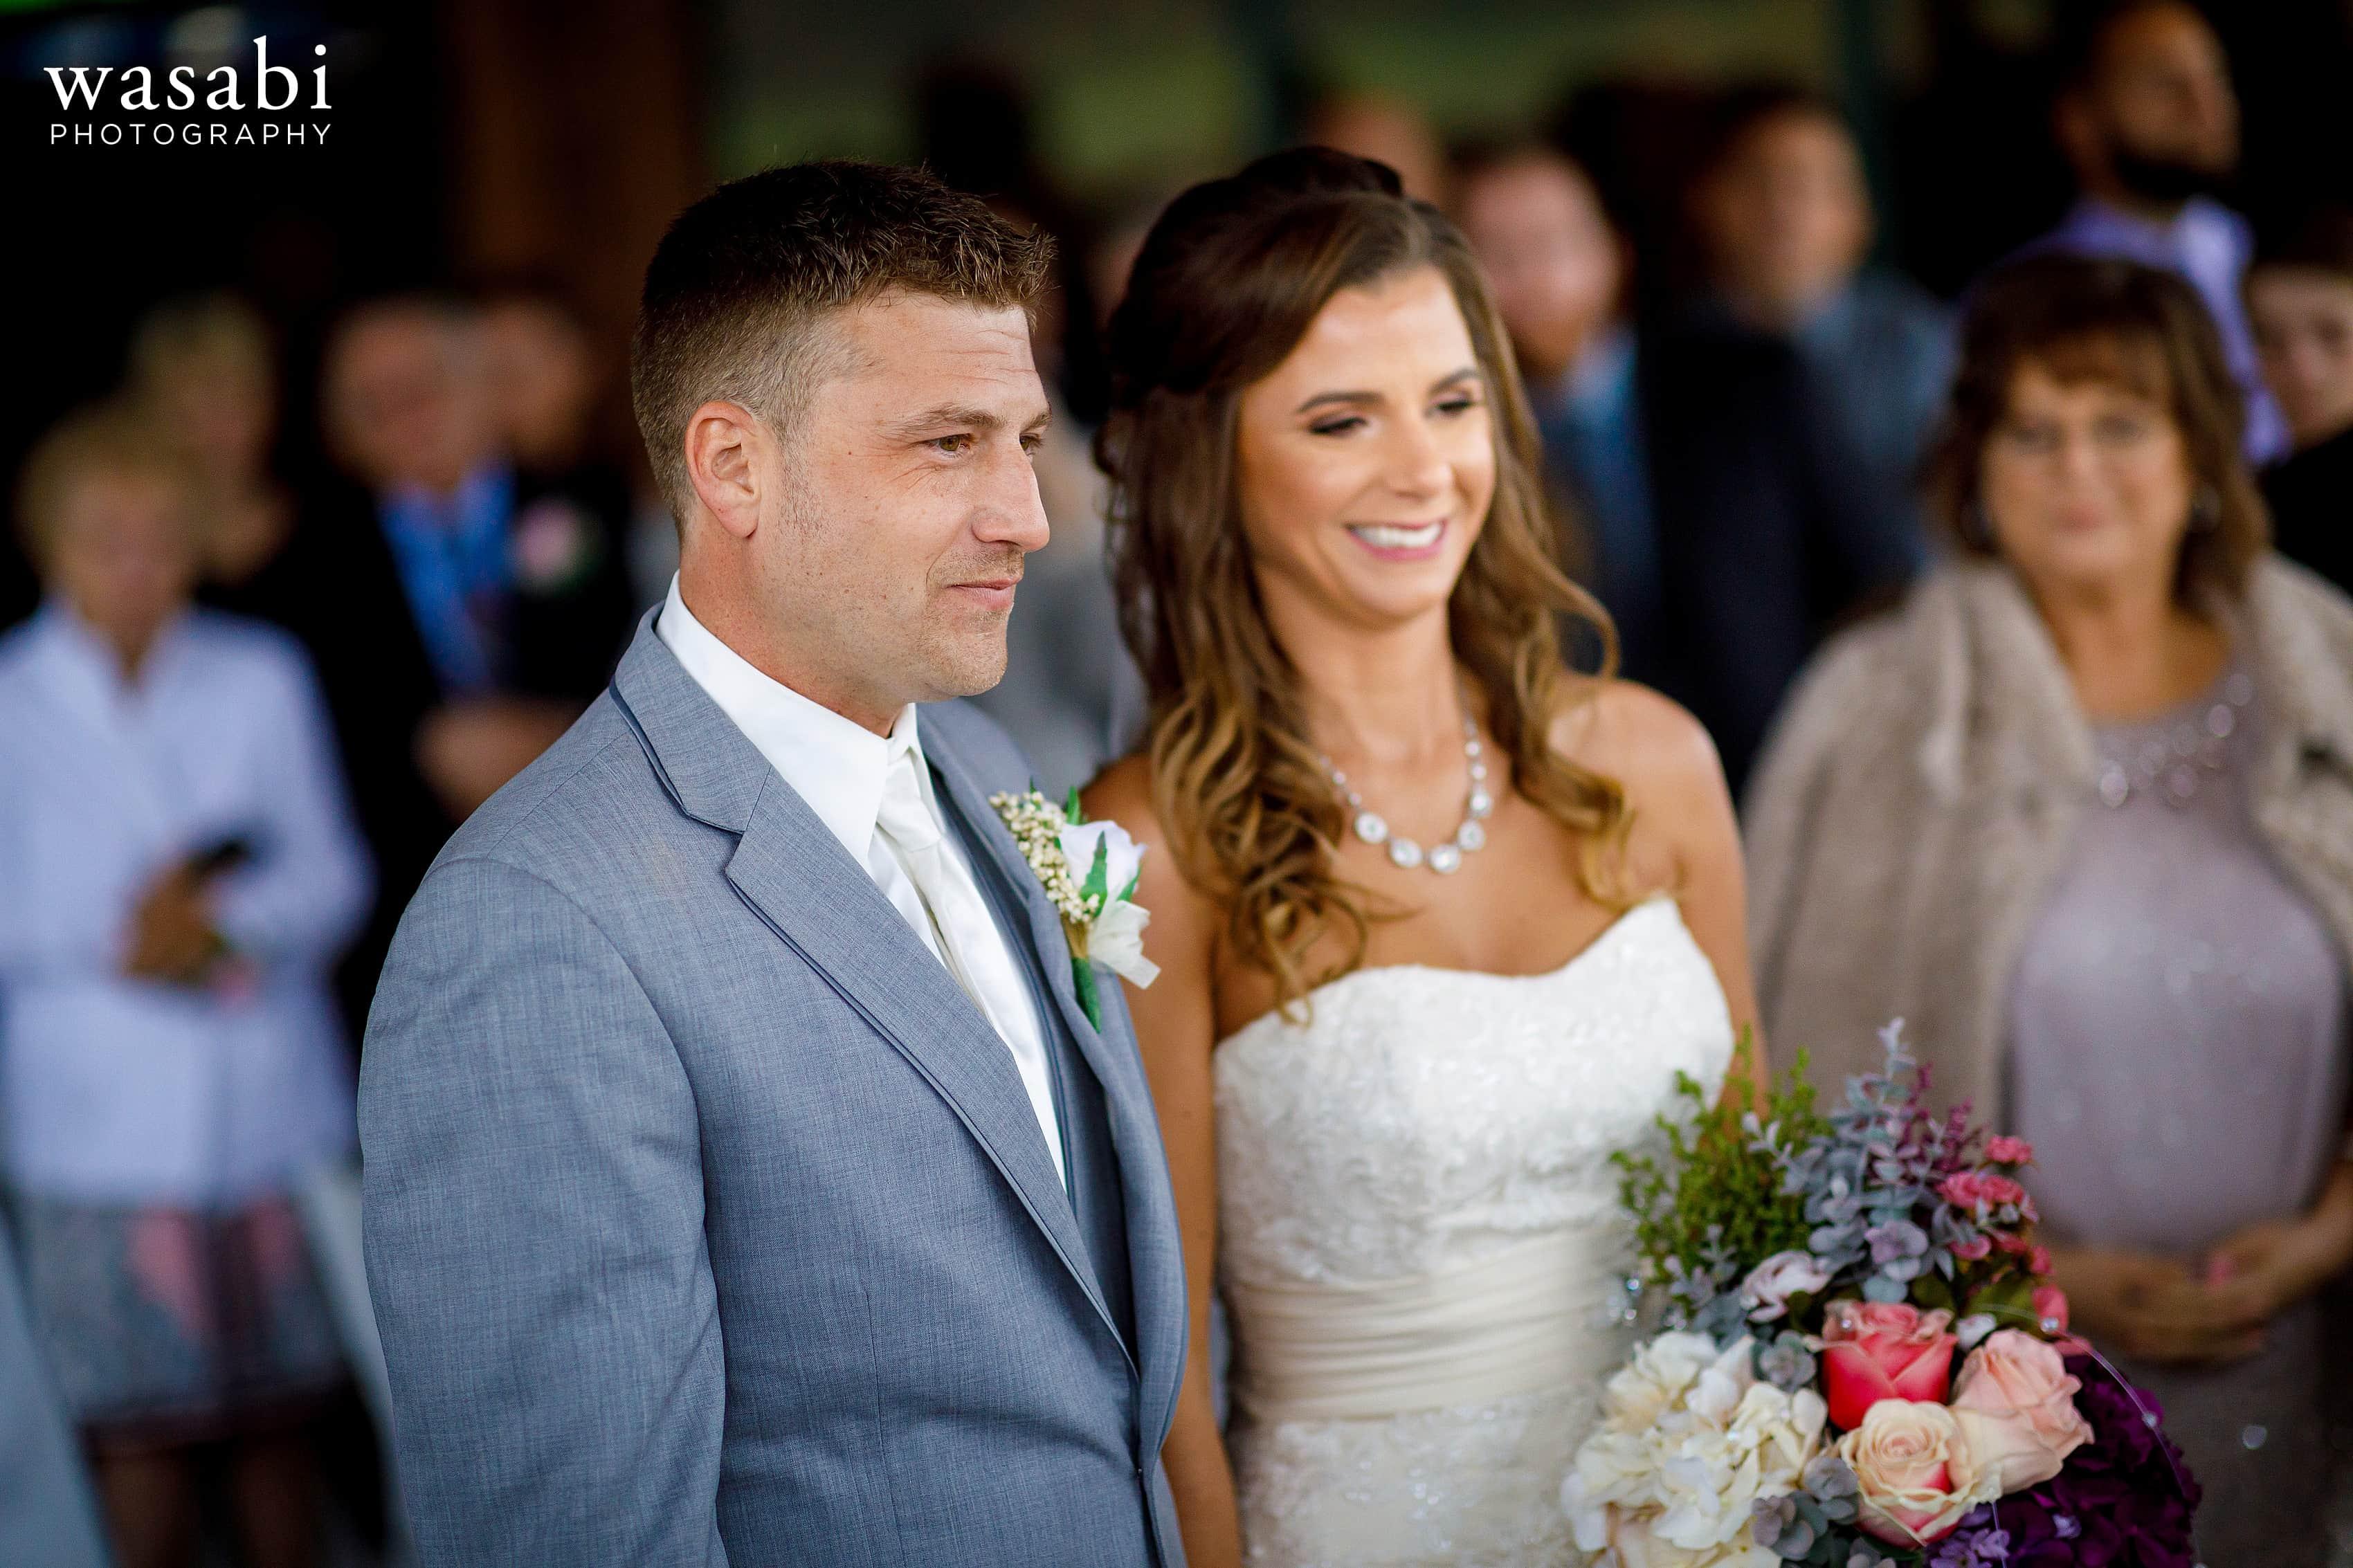 Bride and groom during Buck's Run Golf Club wedding ceremony in Mount Pleasant, Michigan.